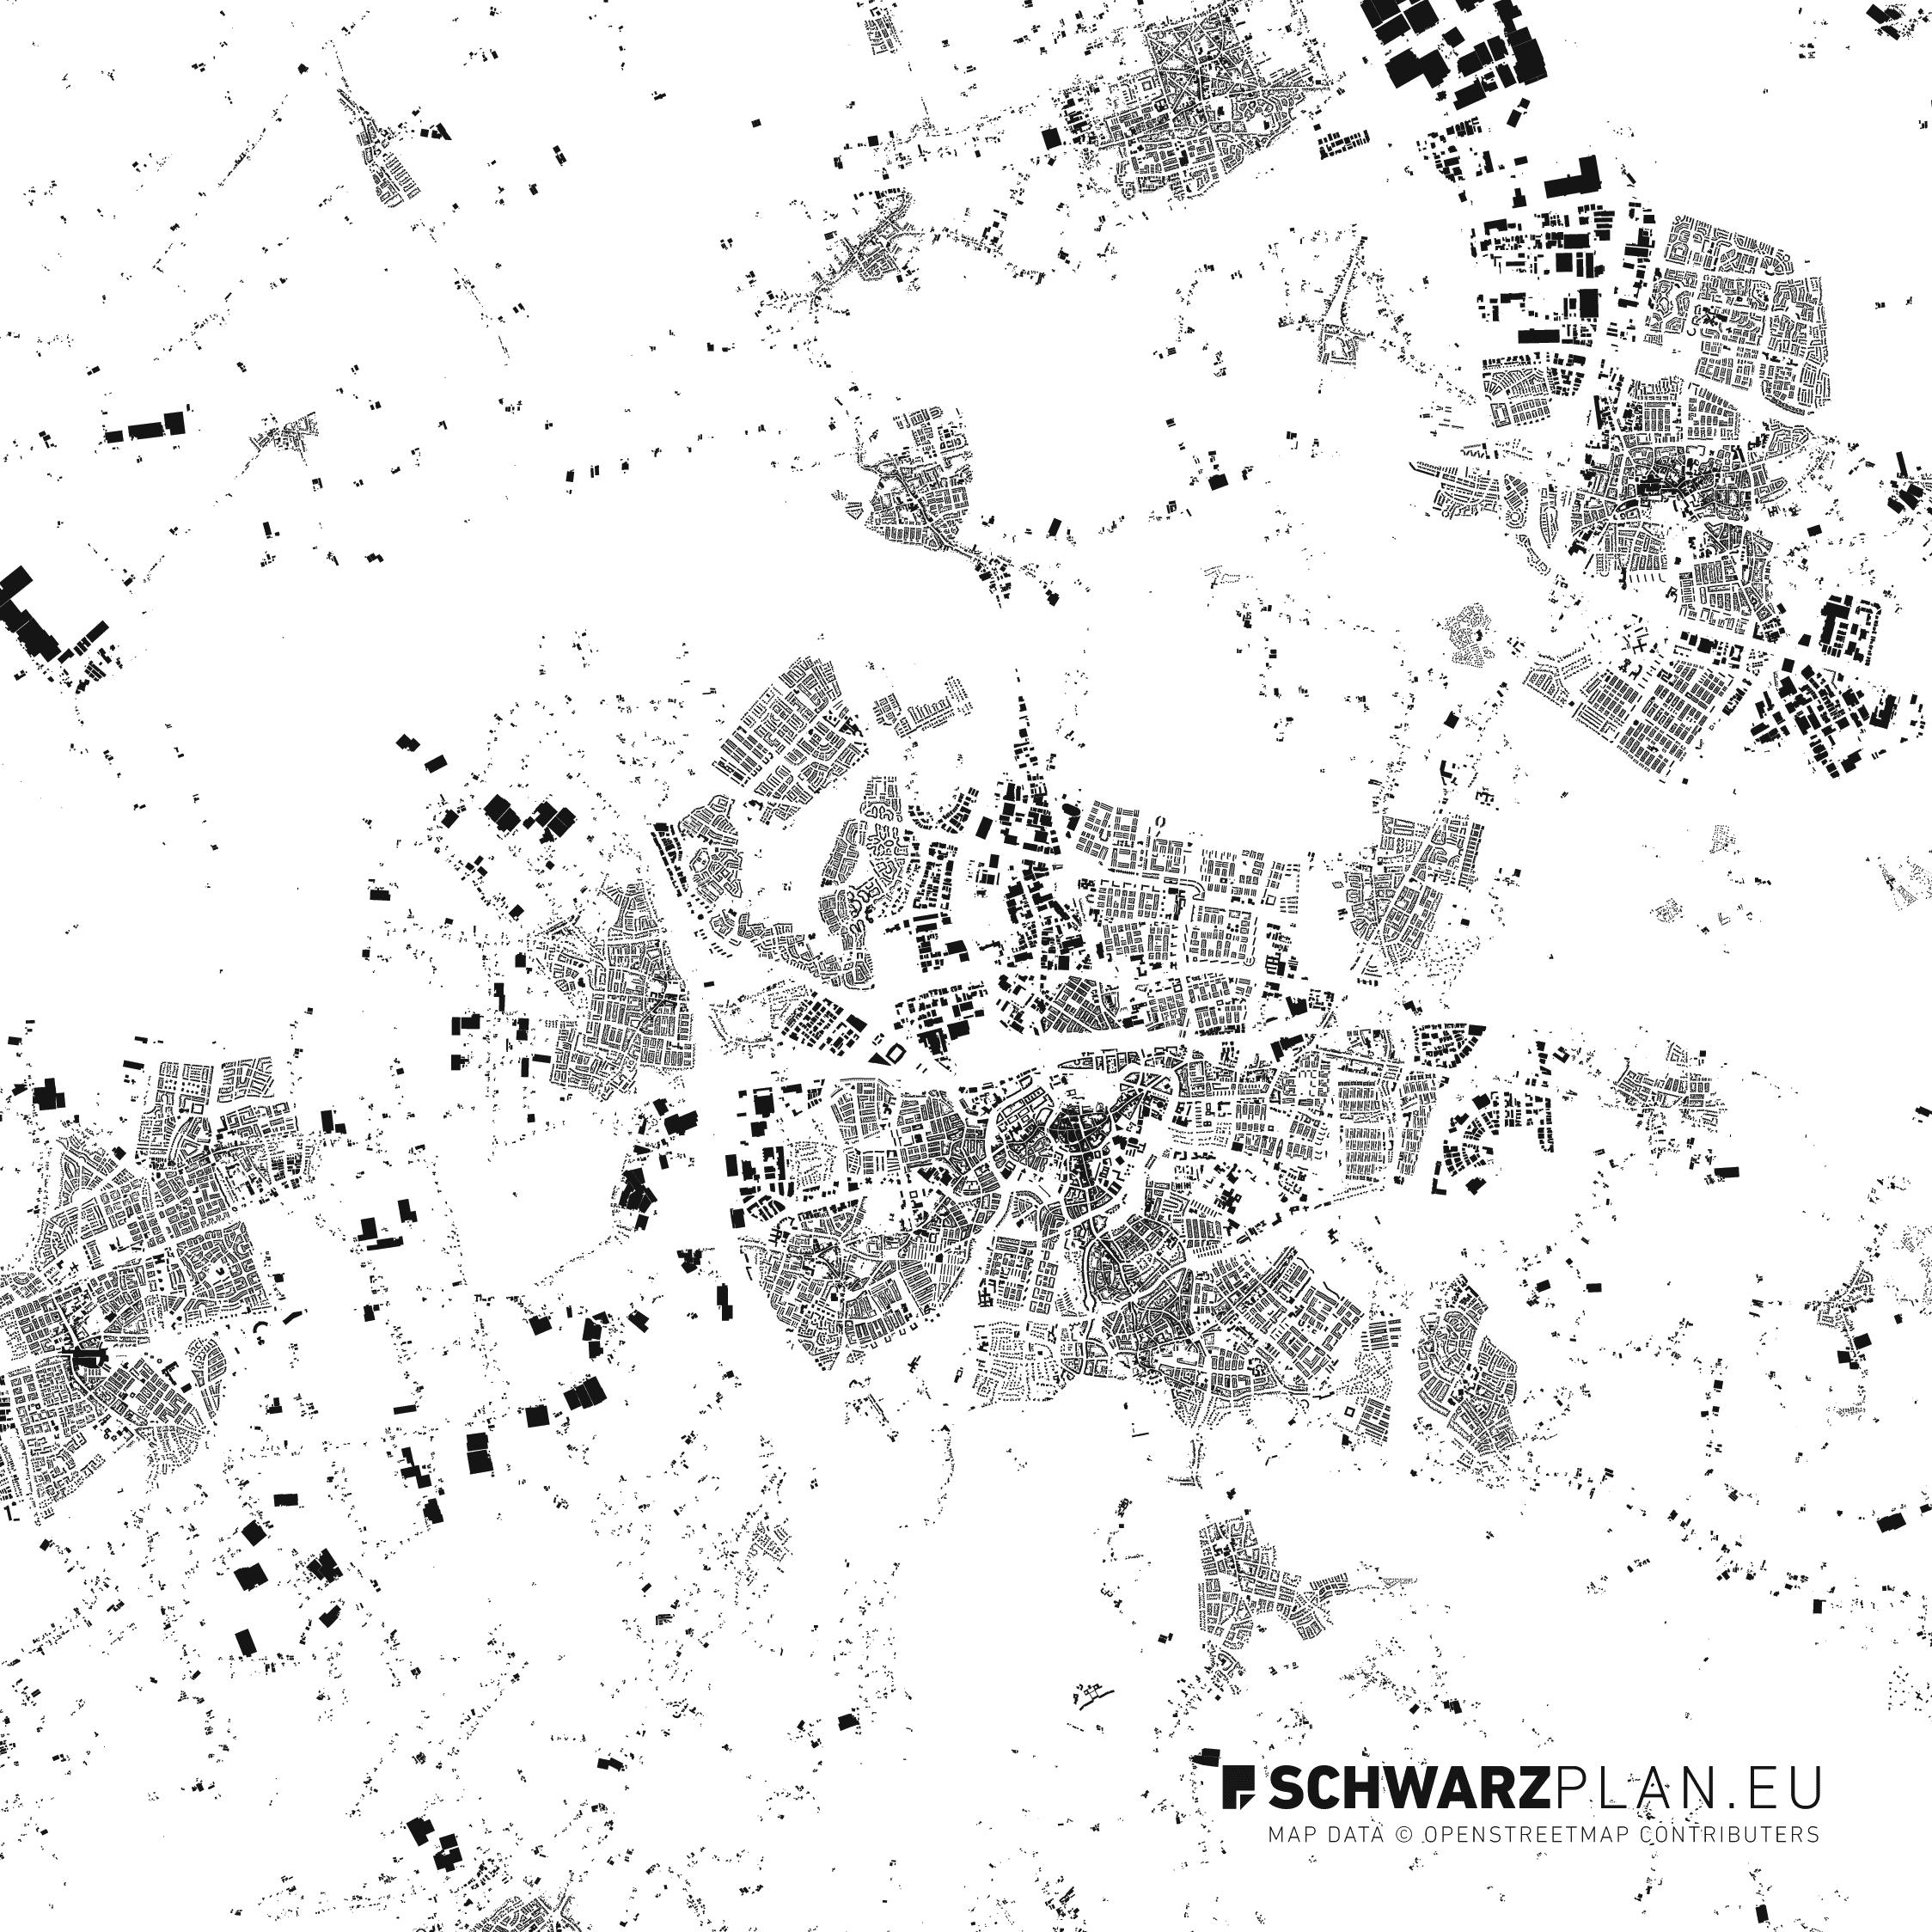 Figure ground plan of Breda